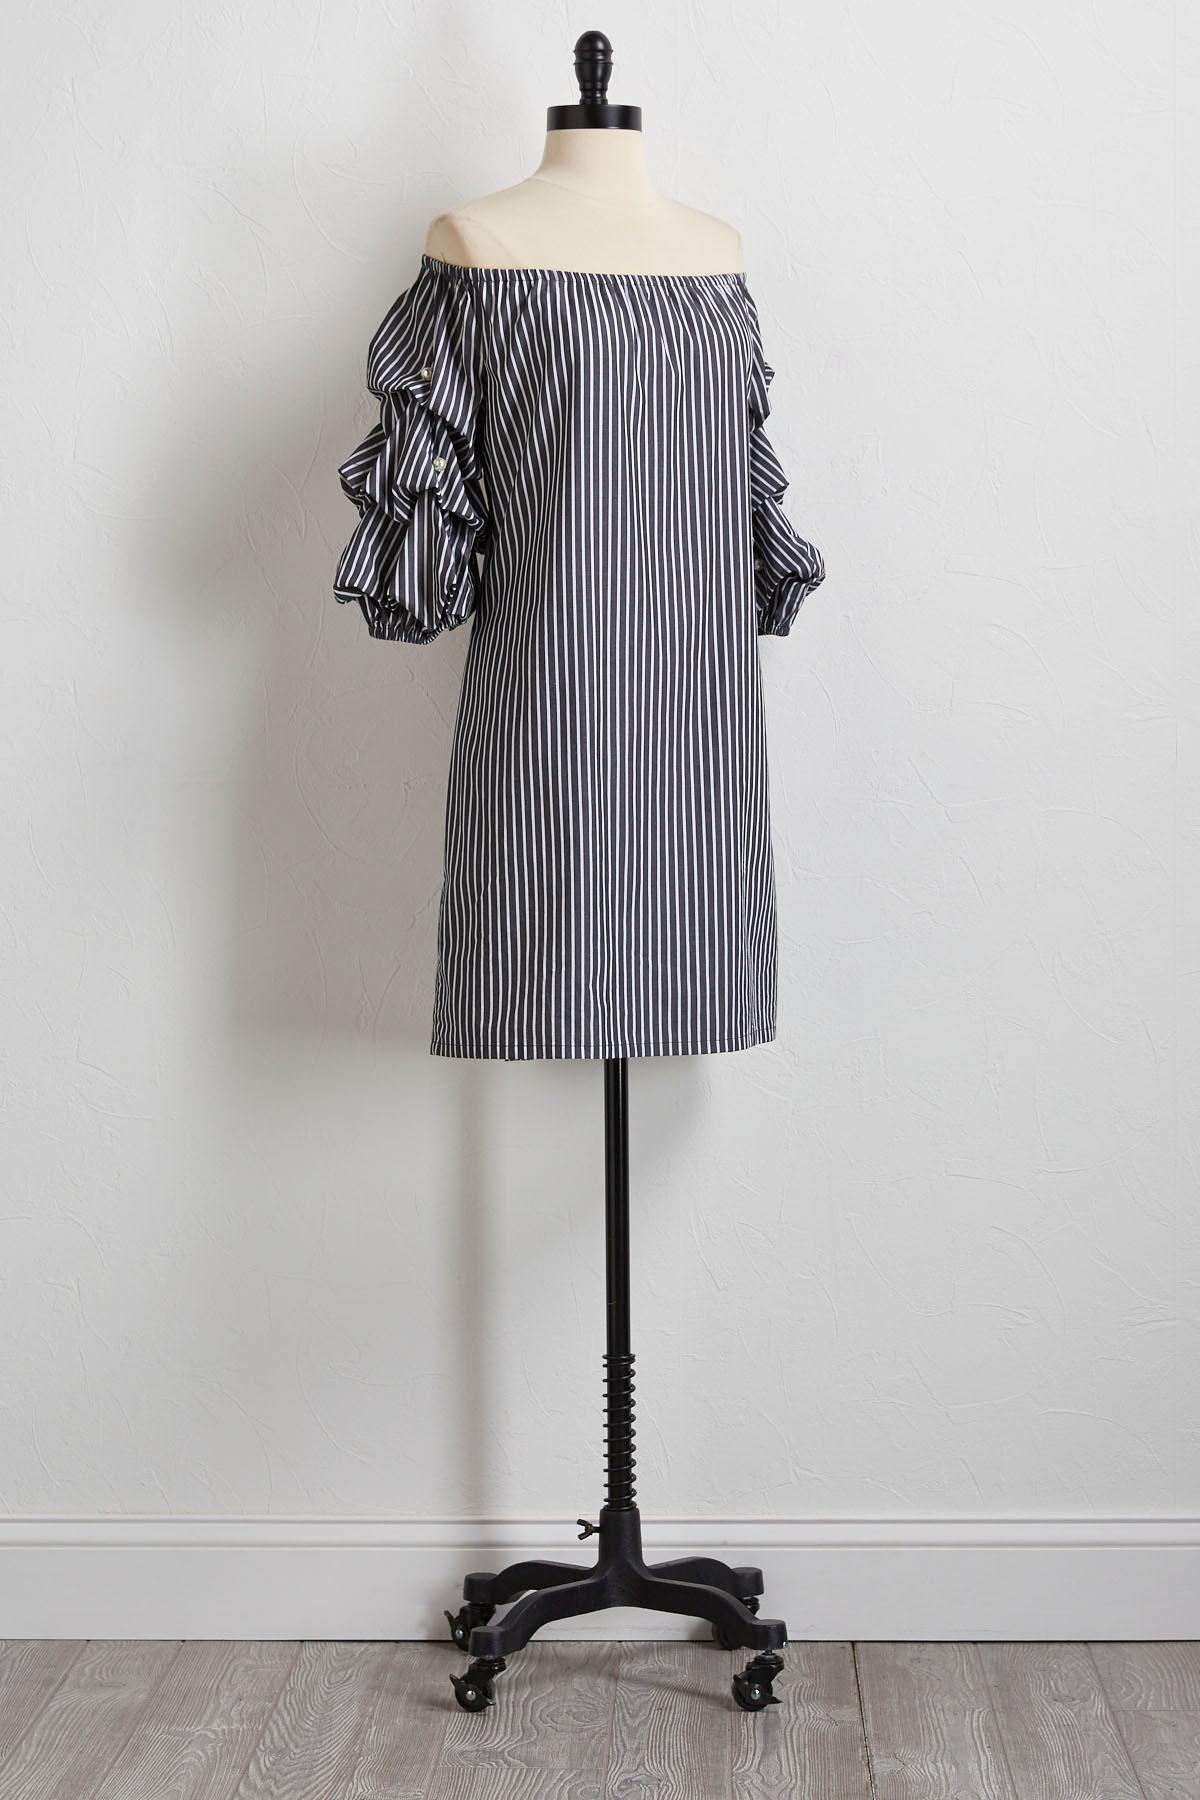 Striped Pearl Embellished Dress